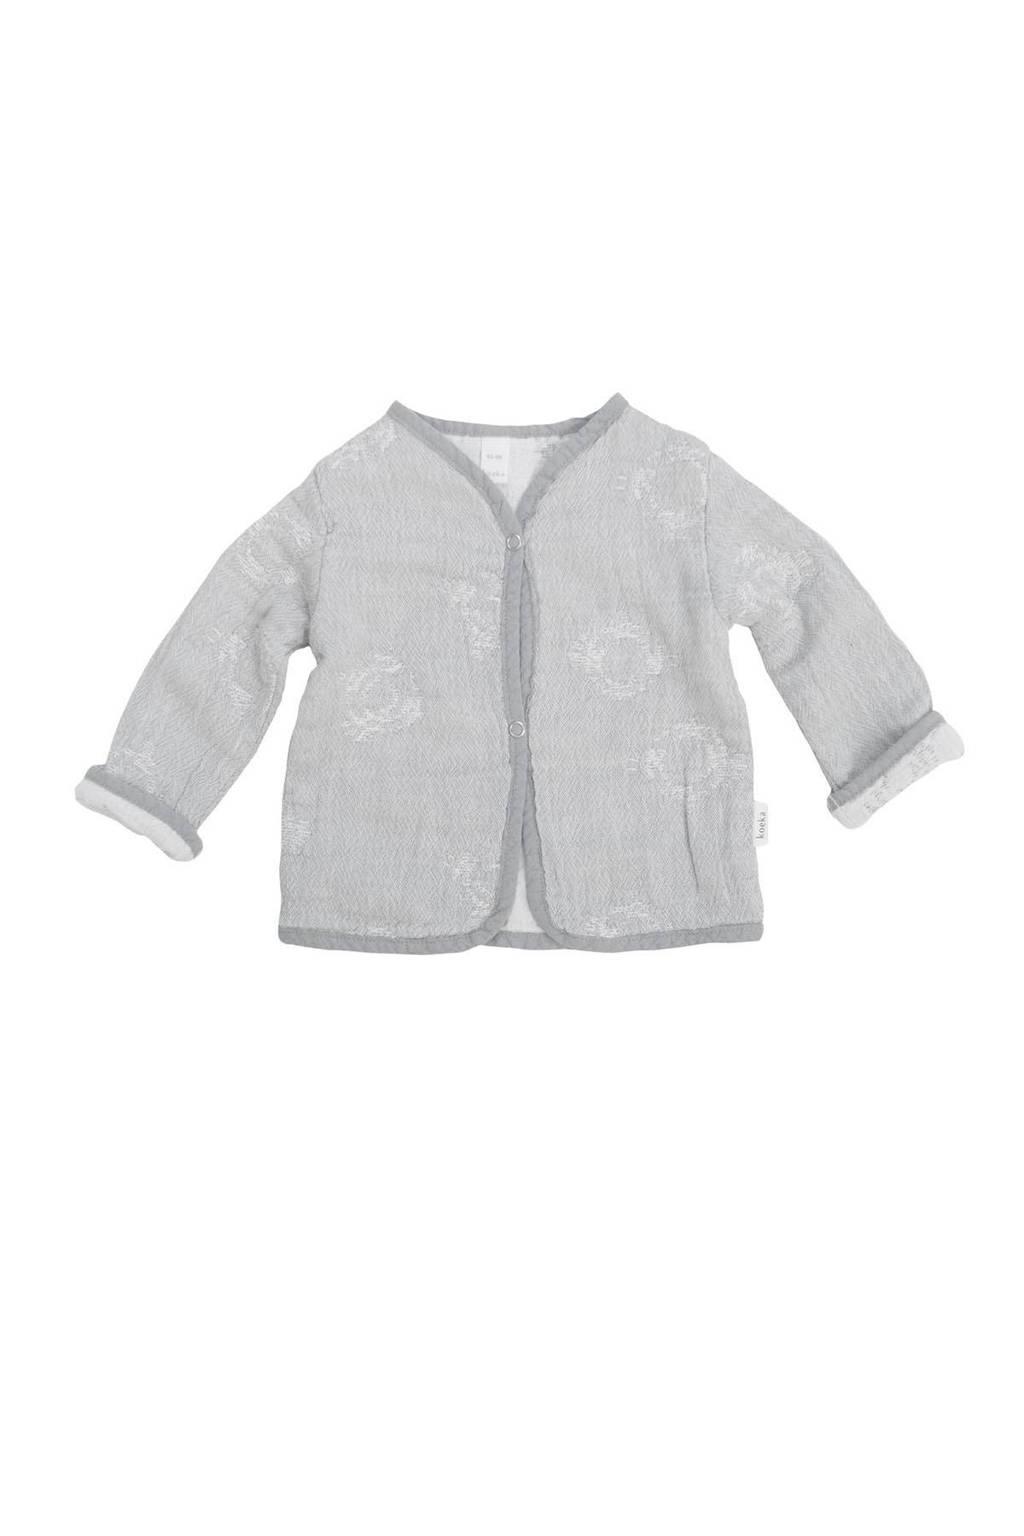 Koeka vest Portobello steel grey, Steel grey